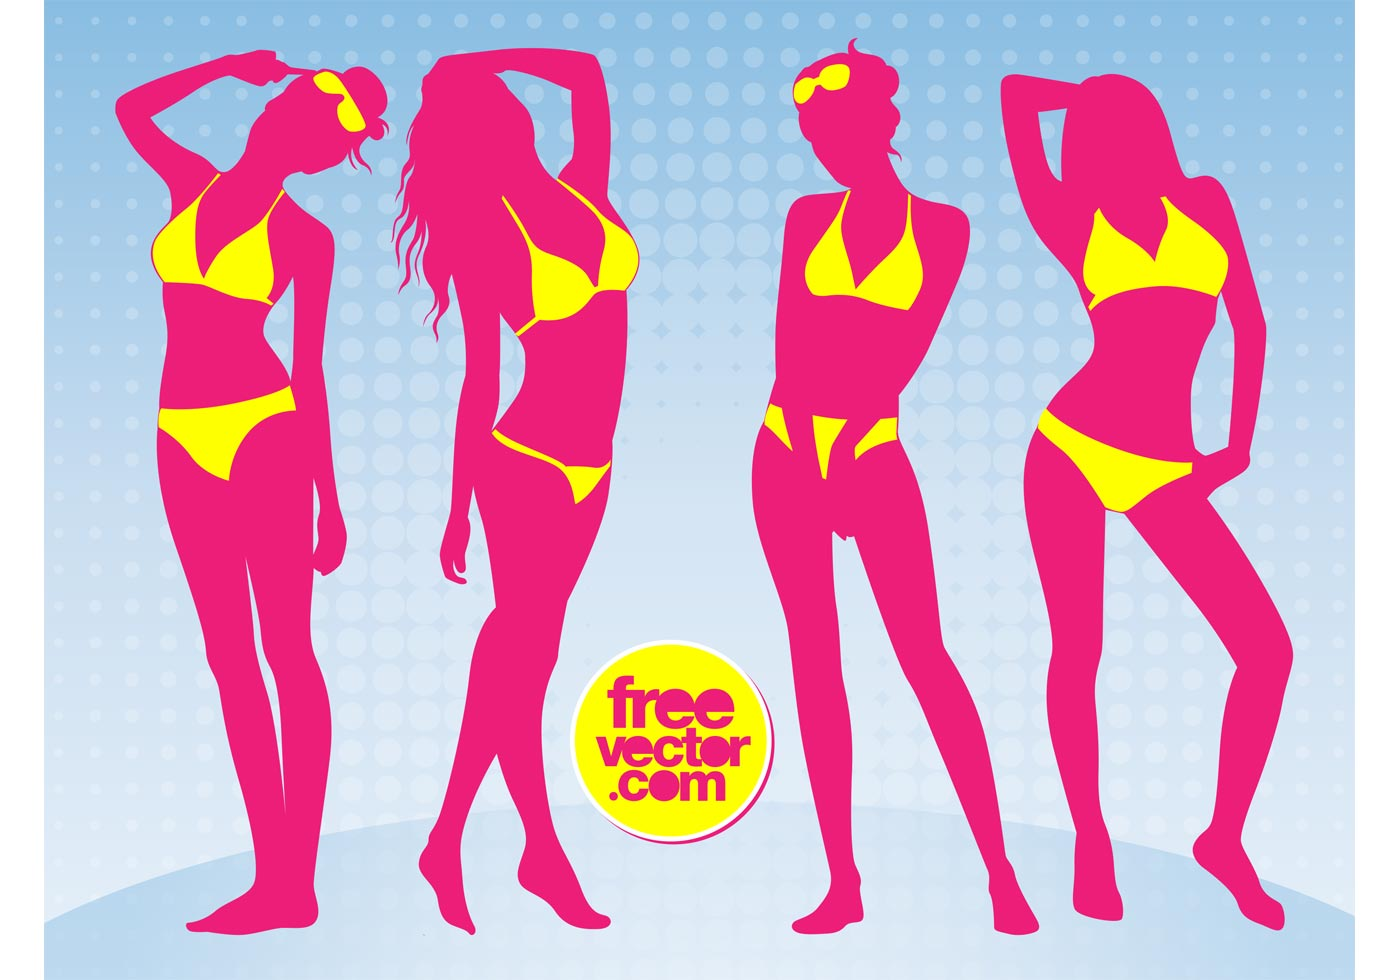 Bikini Girls - Download Free Vector Art, Stock Graphics  Images-6393